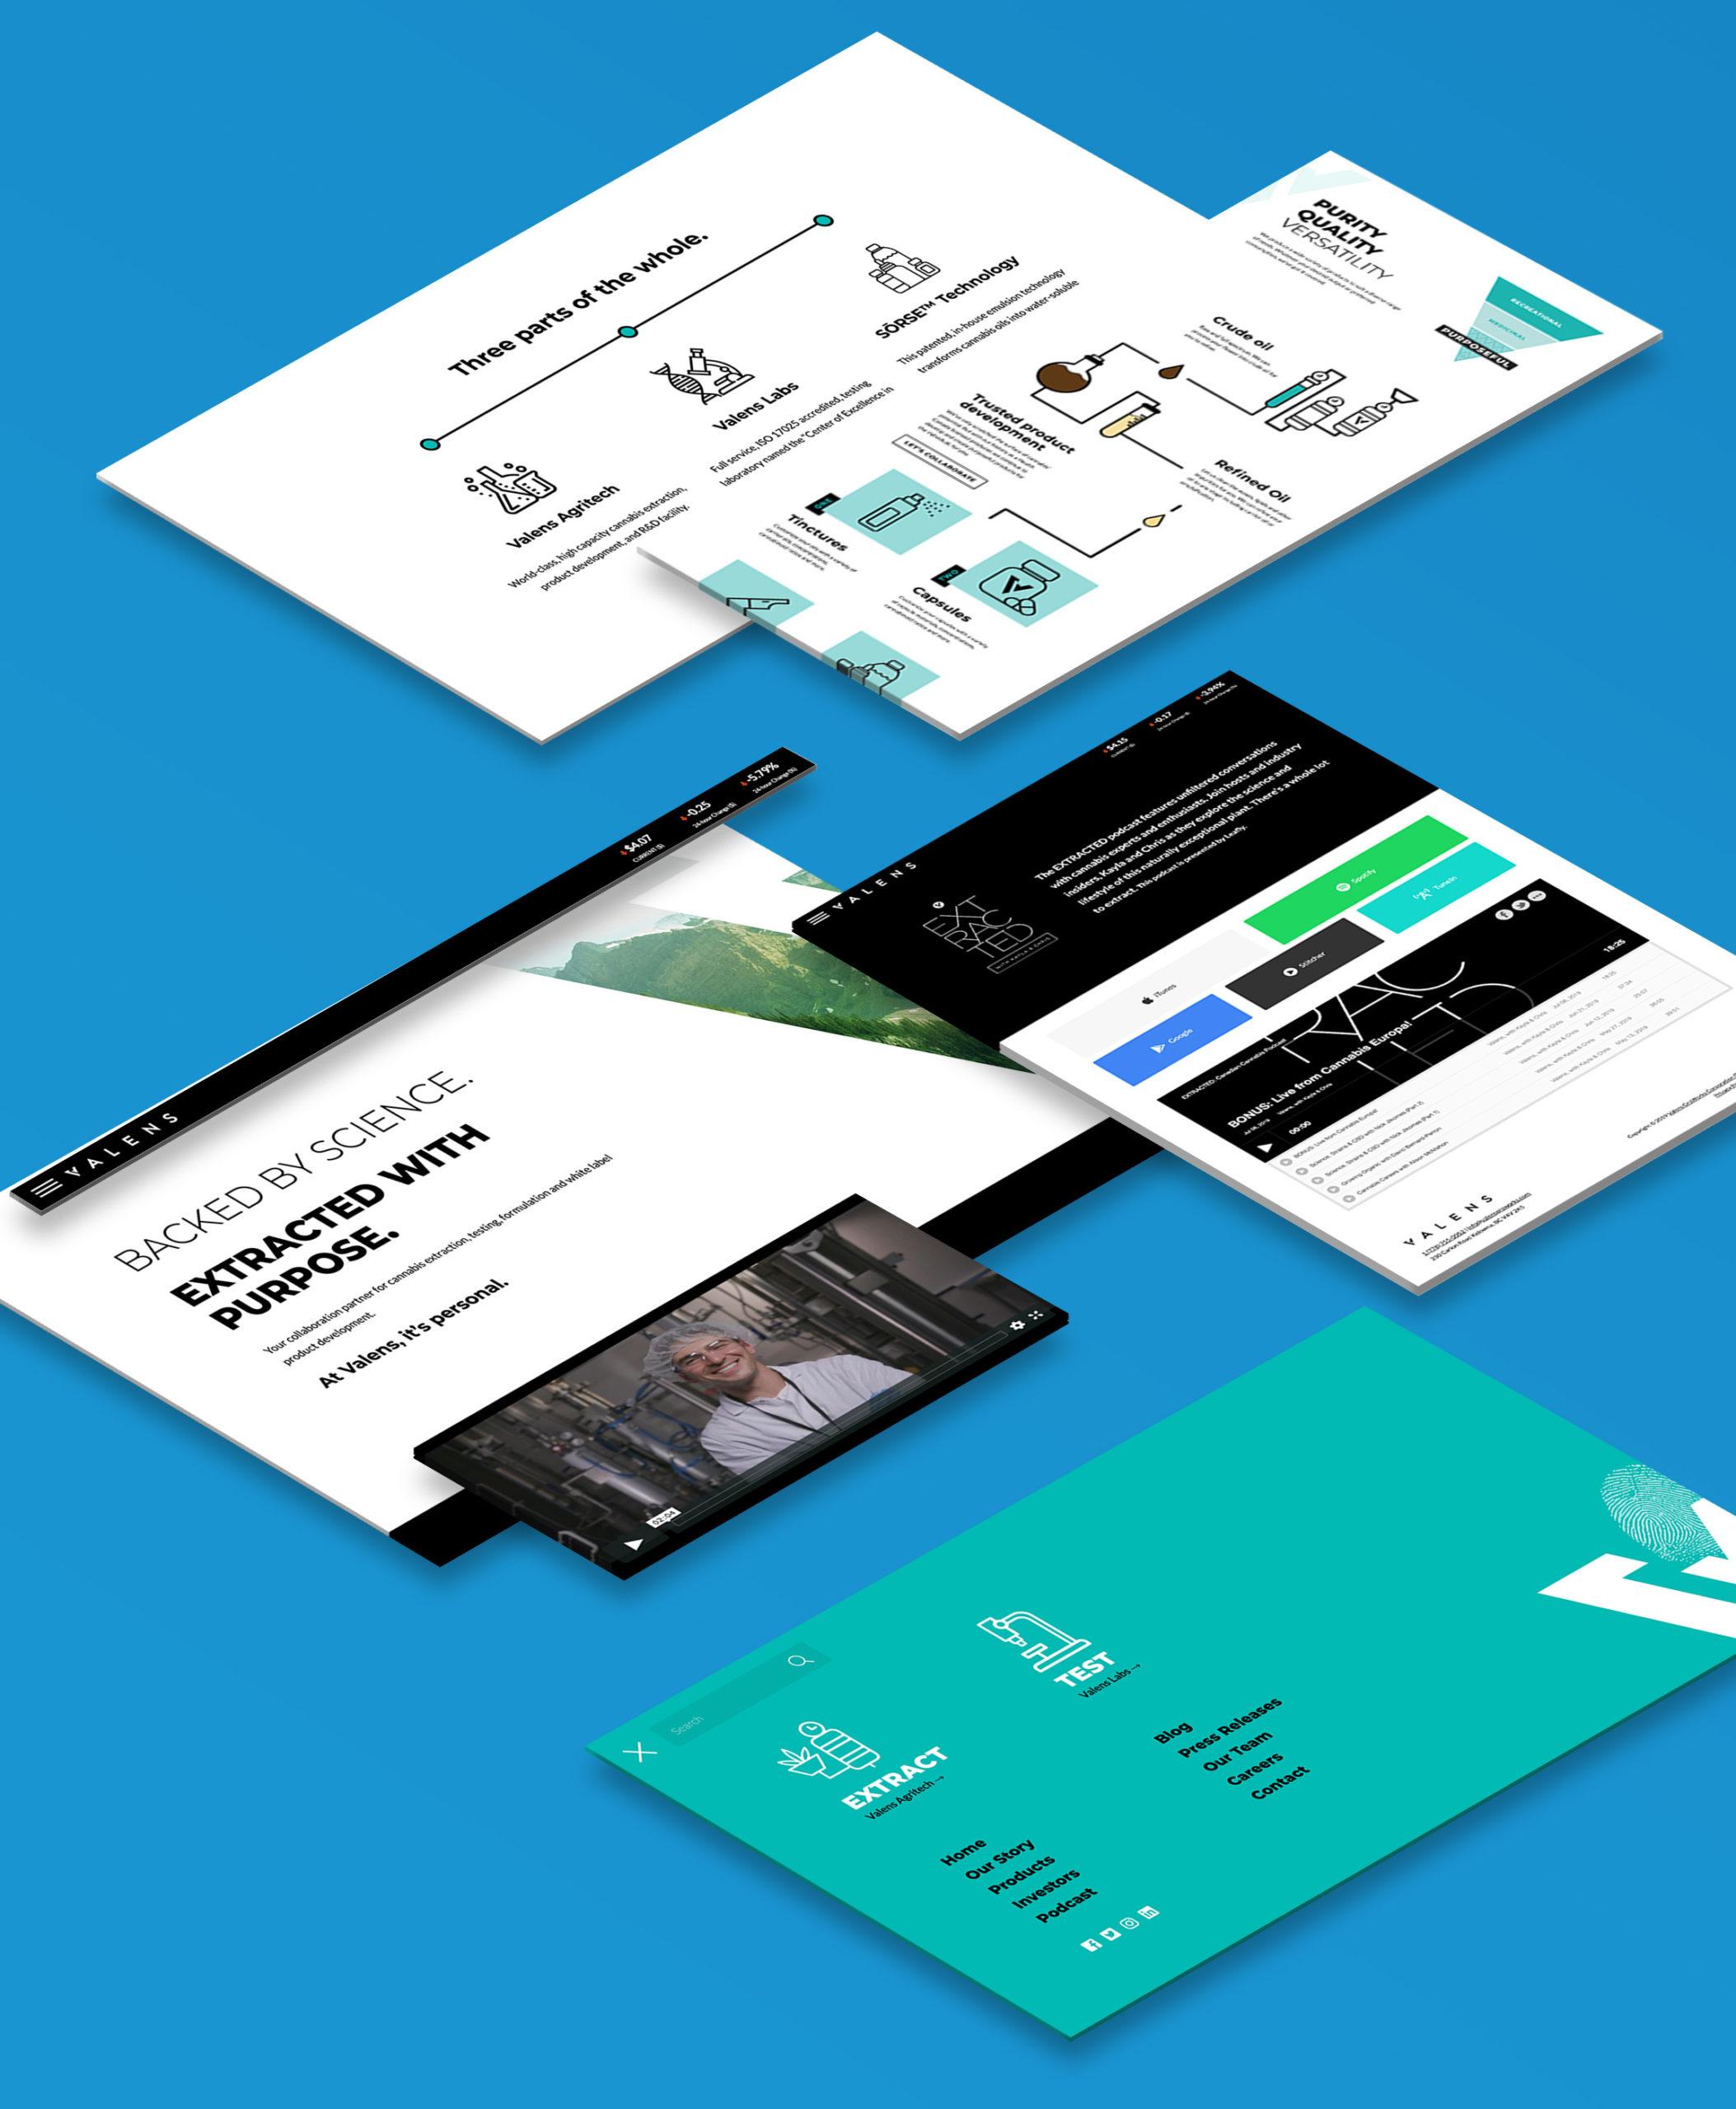 Valens Web Design Mockup of screenshots on a light blue background